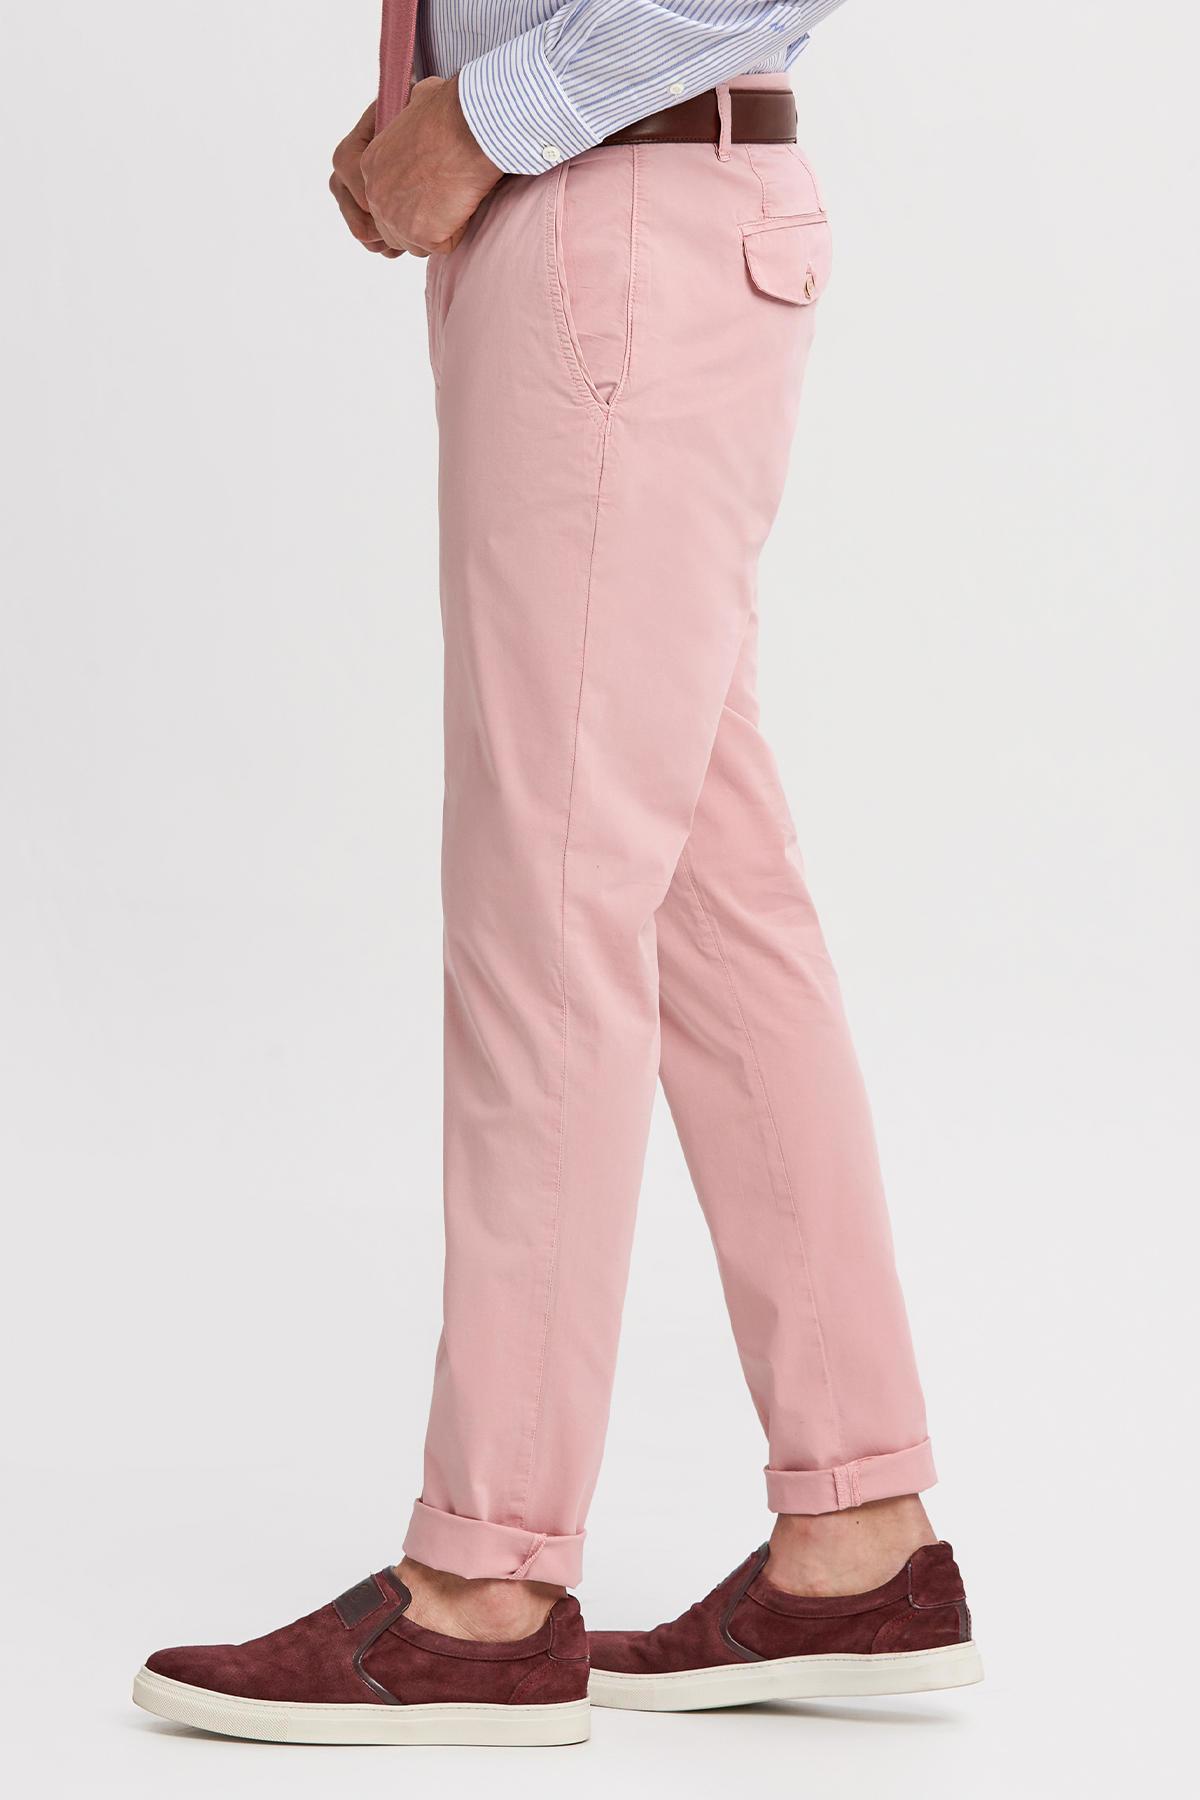 Pembe Pamuk Yazlık Chino Pantolon